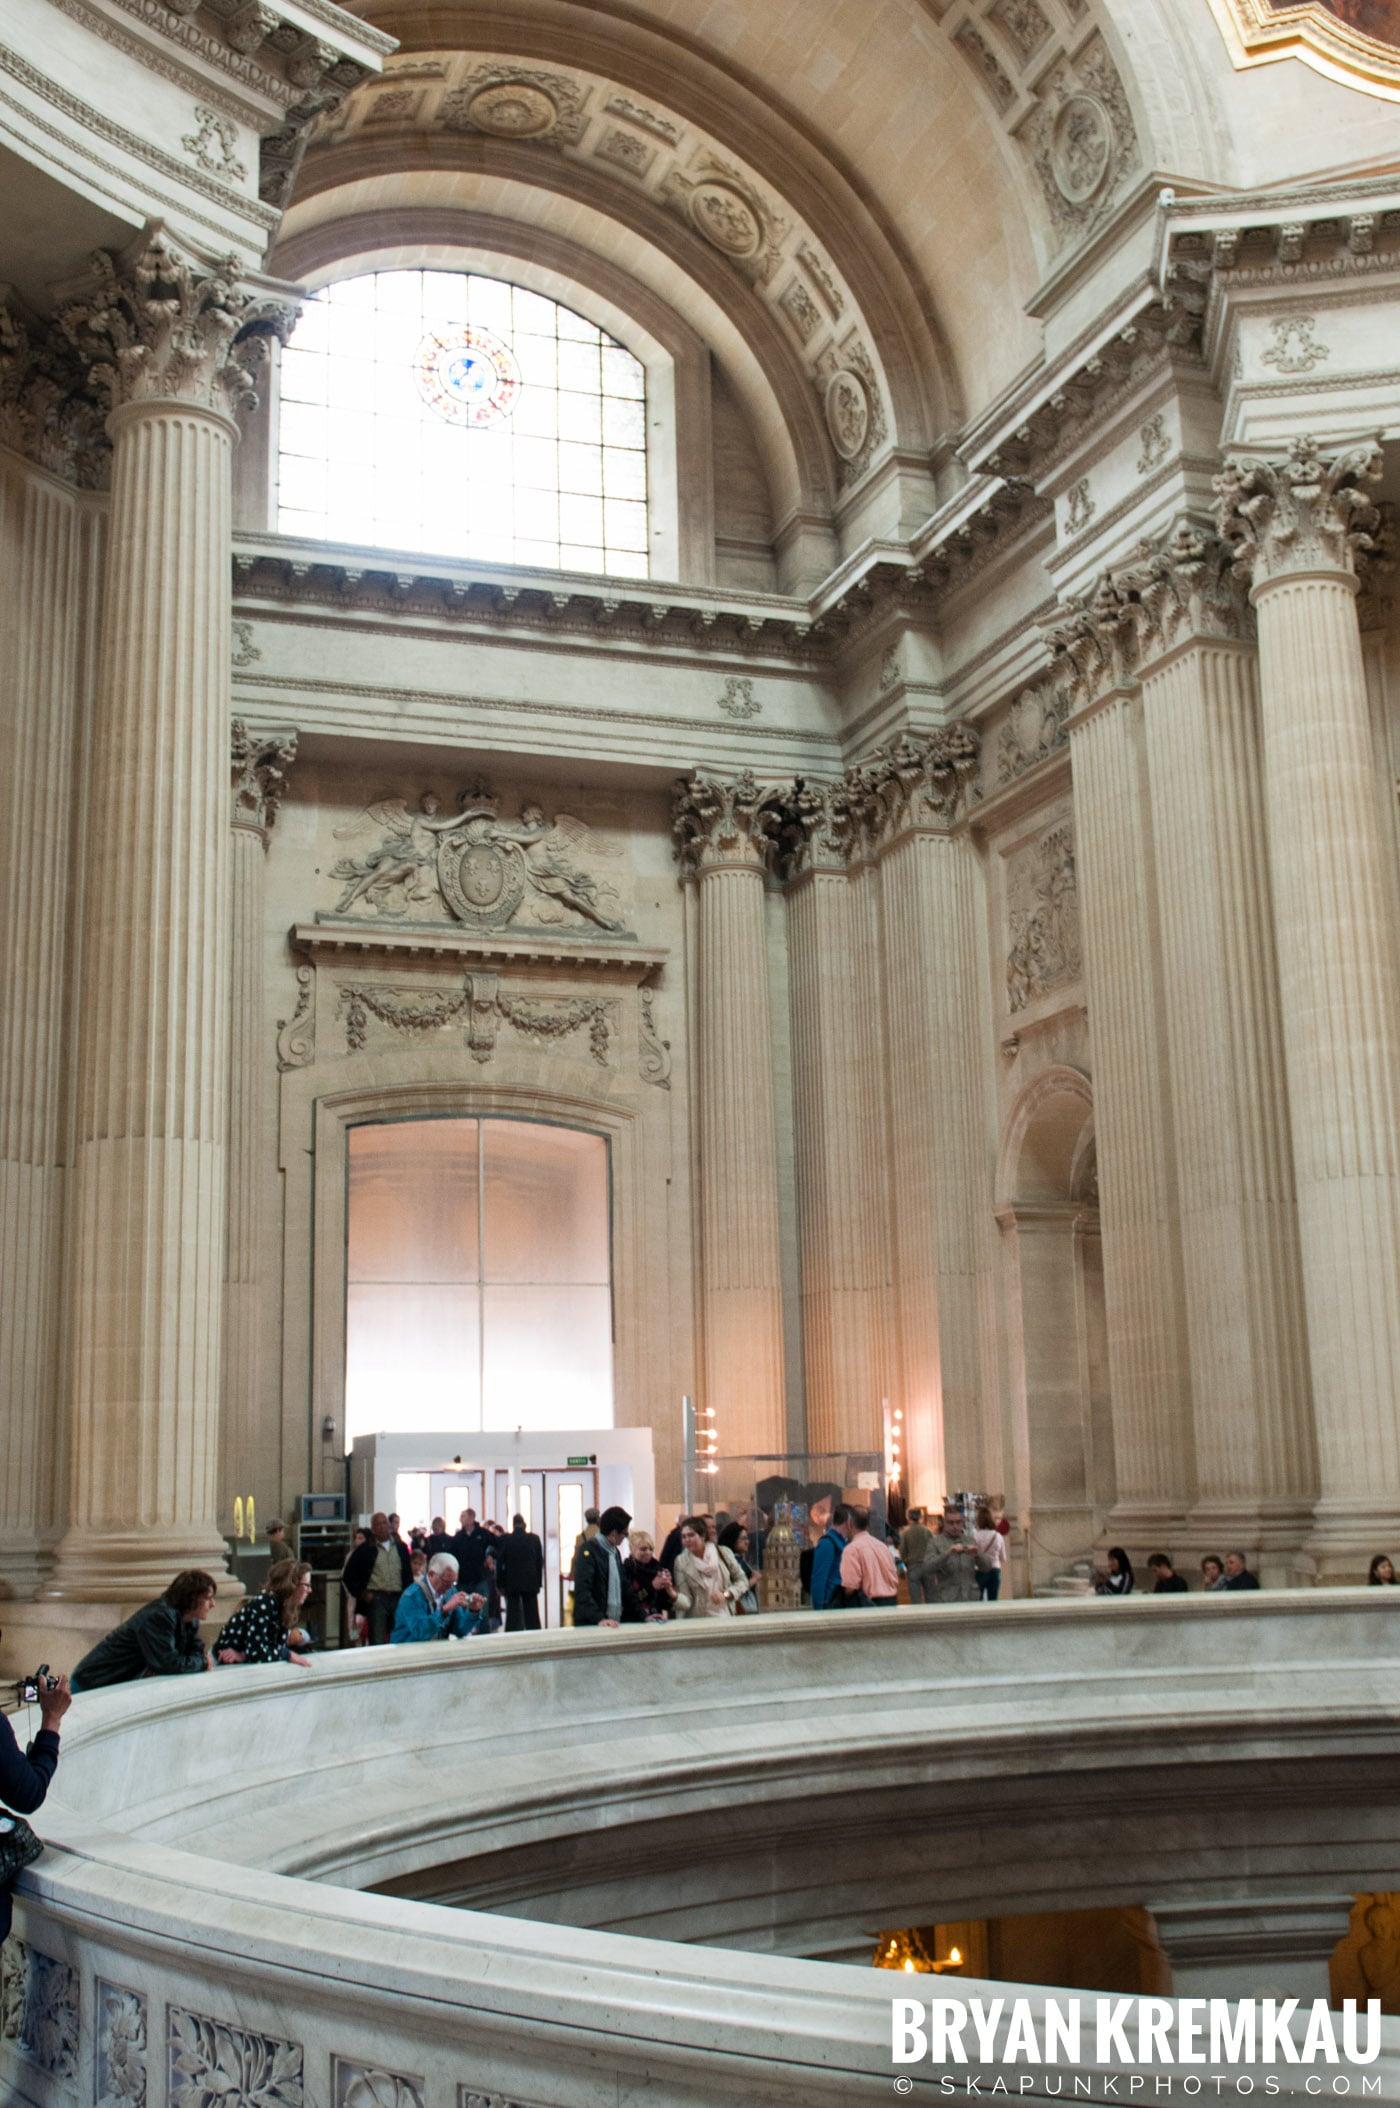 Paris, France Honeymoon - Day 3 - 7.20.11 (24)